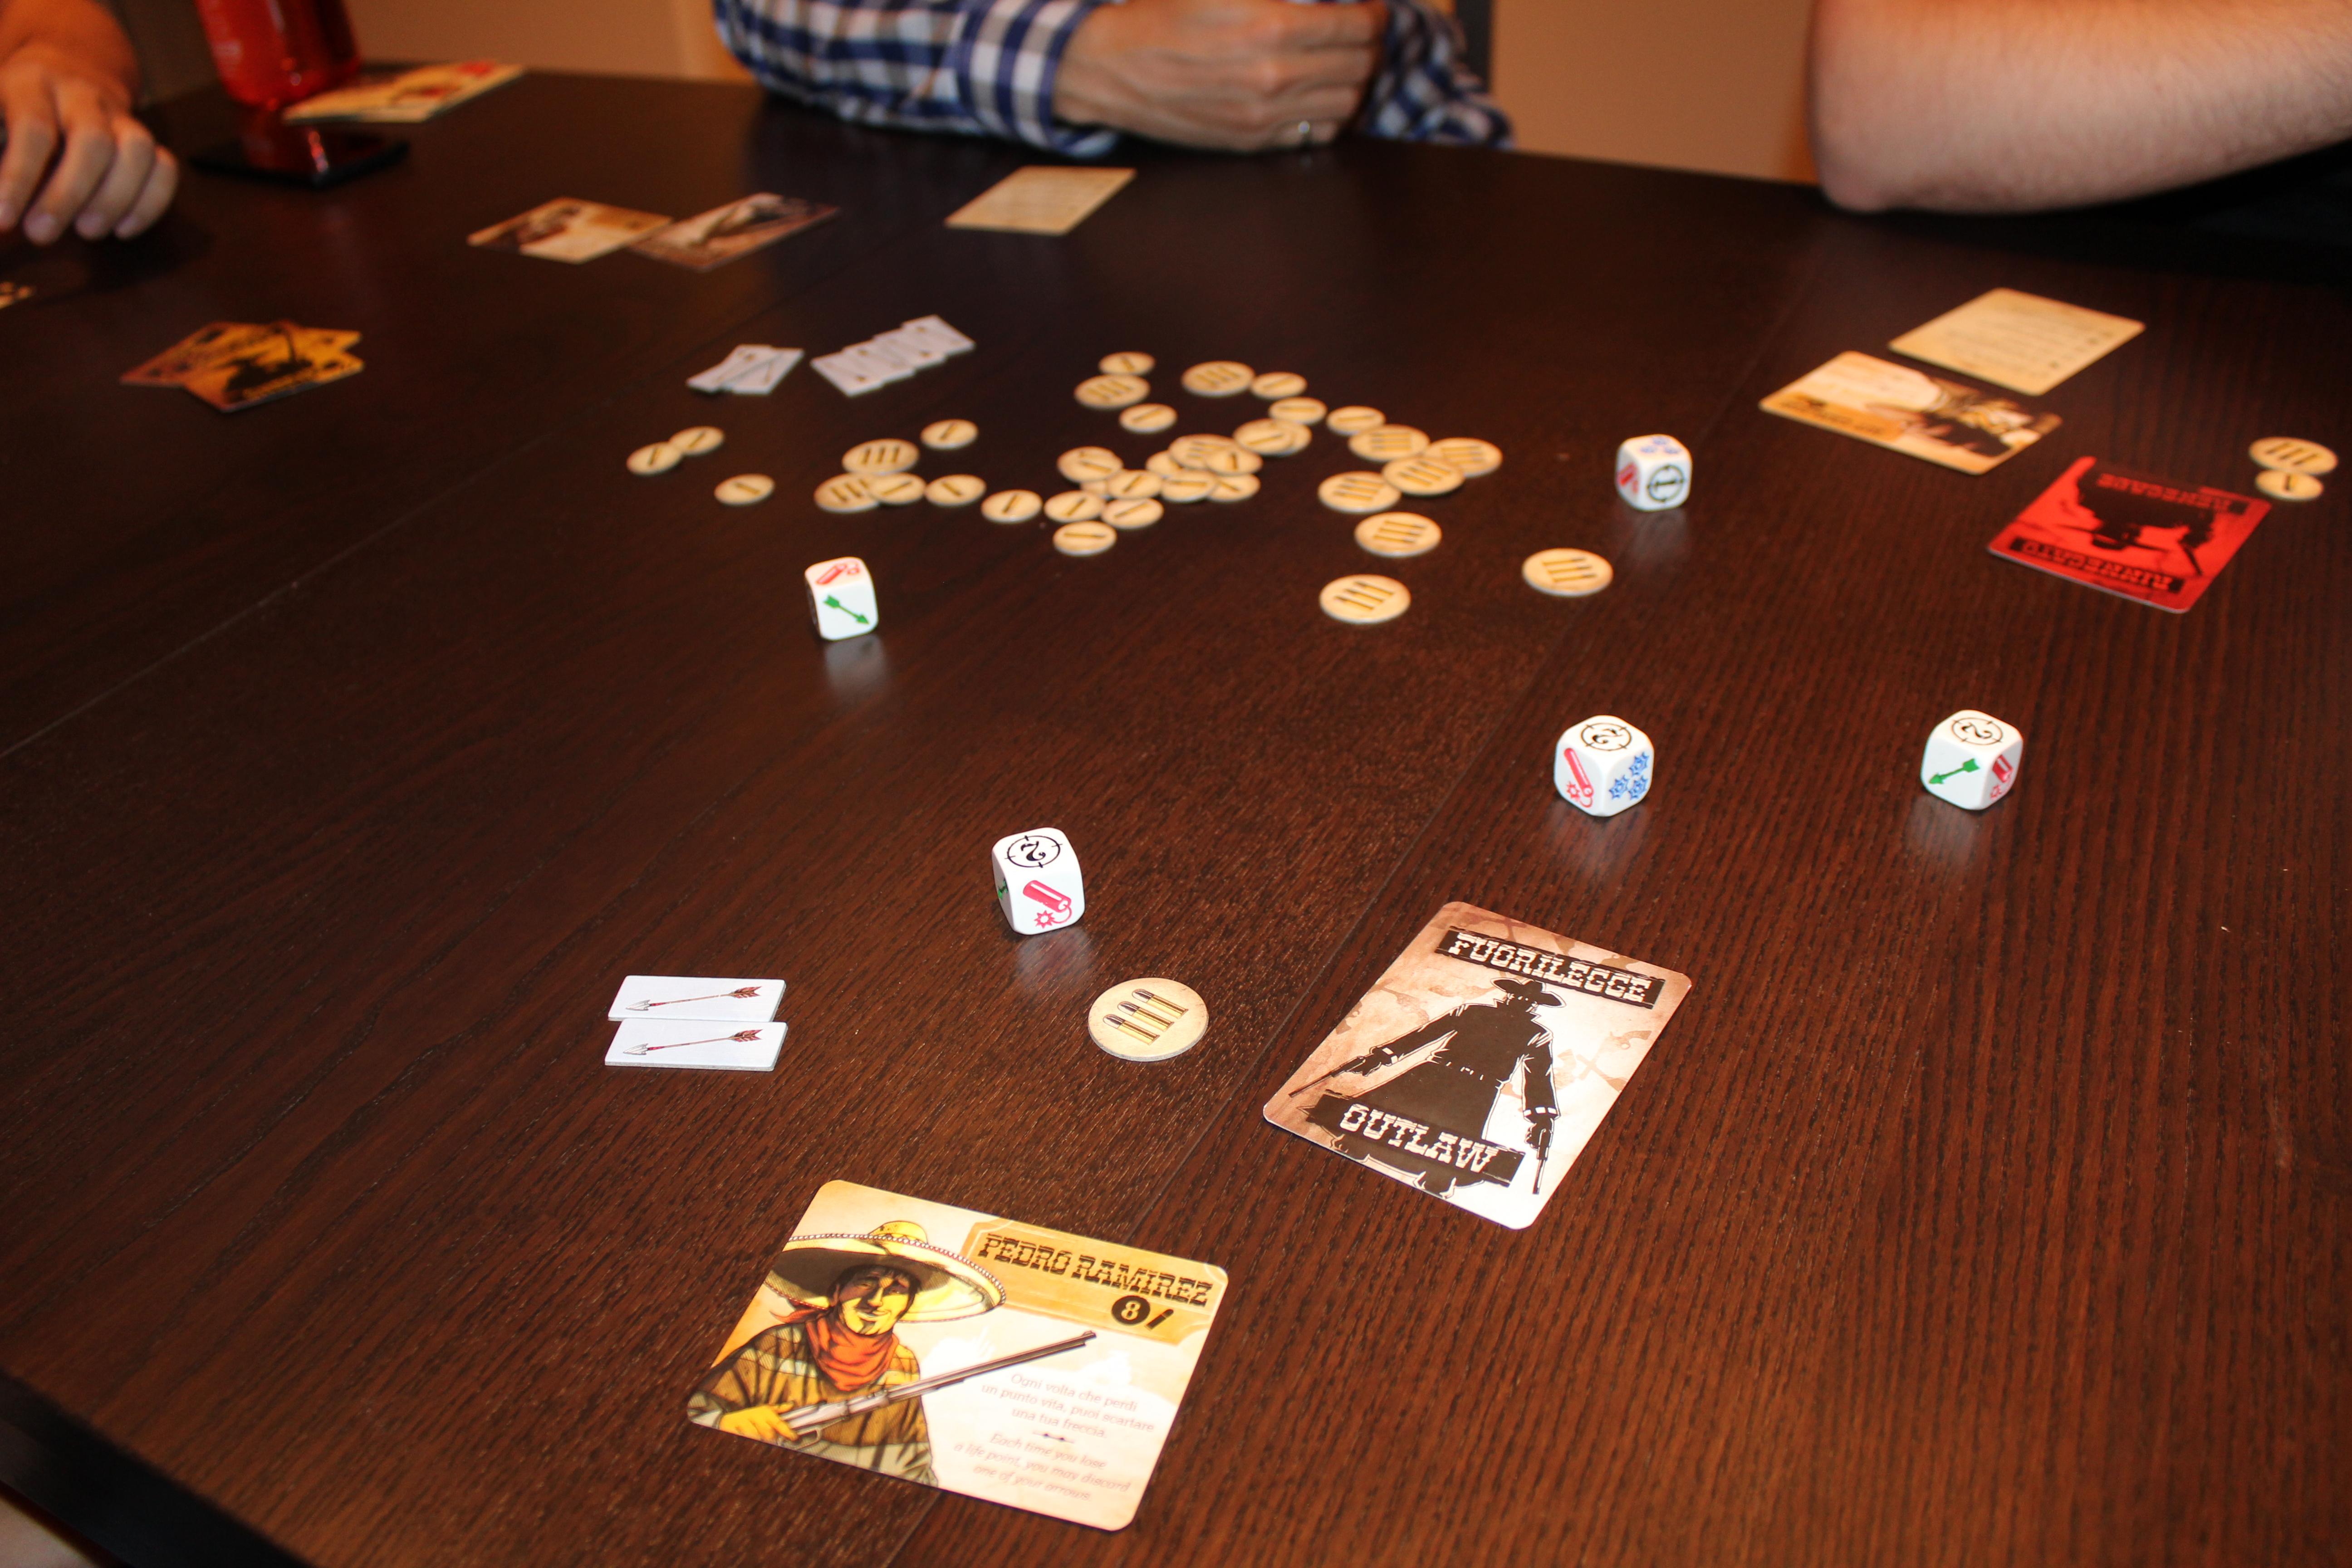 unlucky 7 dice game